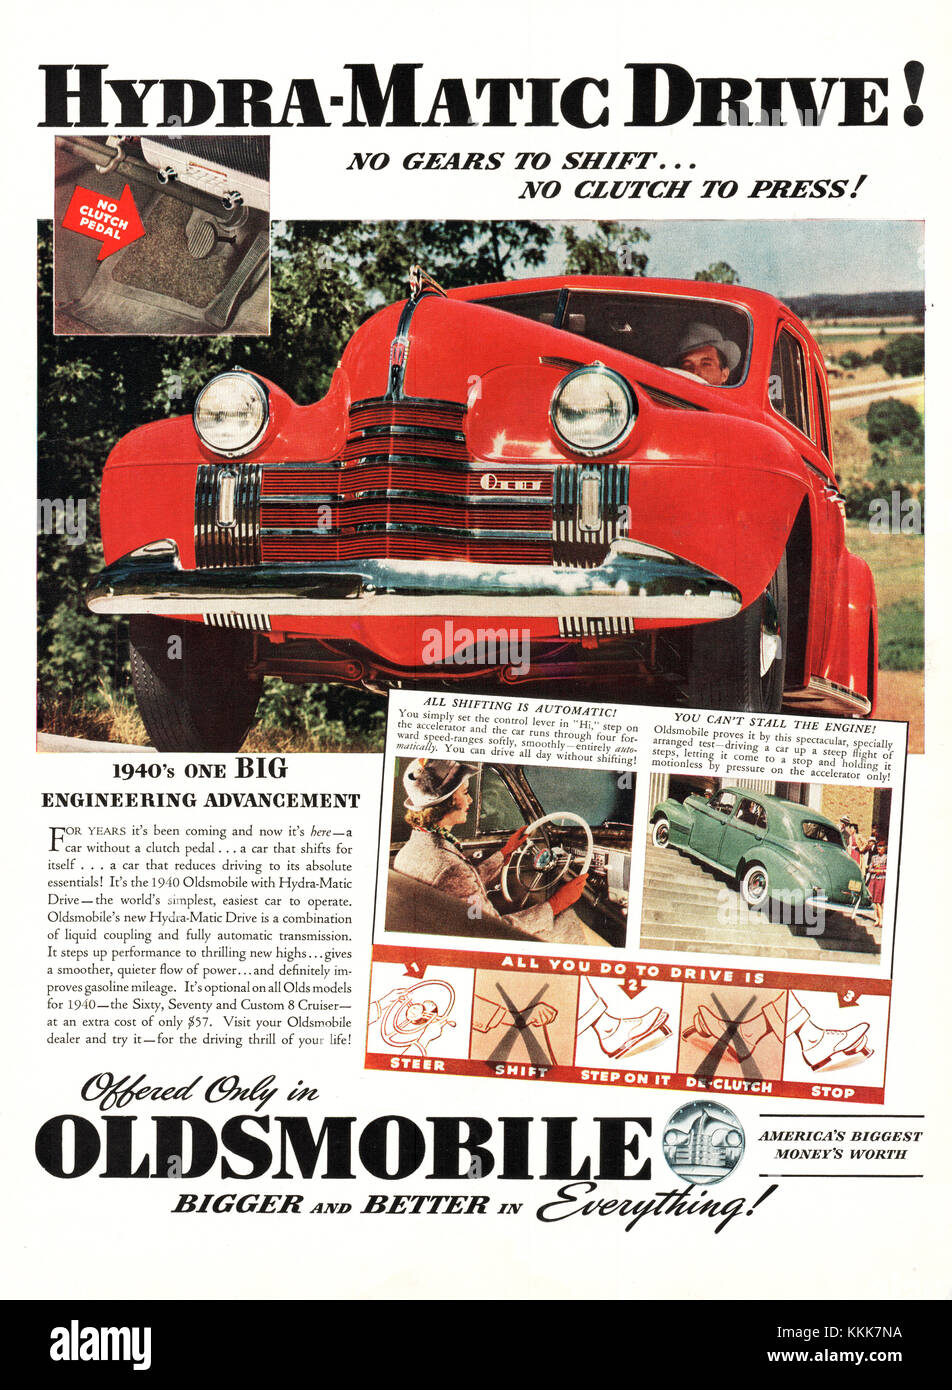 1939 U.S. Magazine Oldsmobile Hydro-Matic Drive Advert - Stock Image